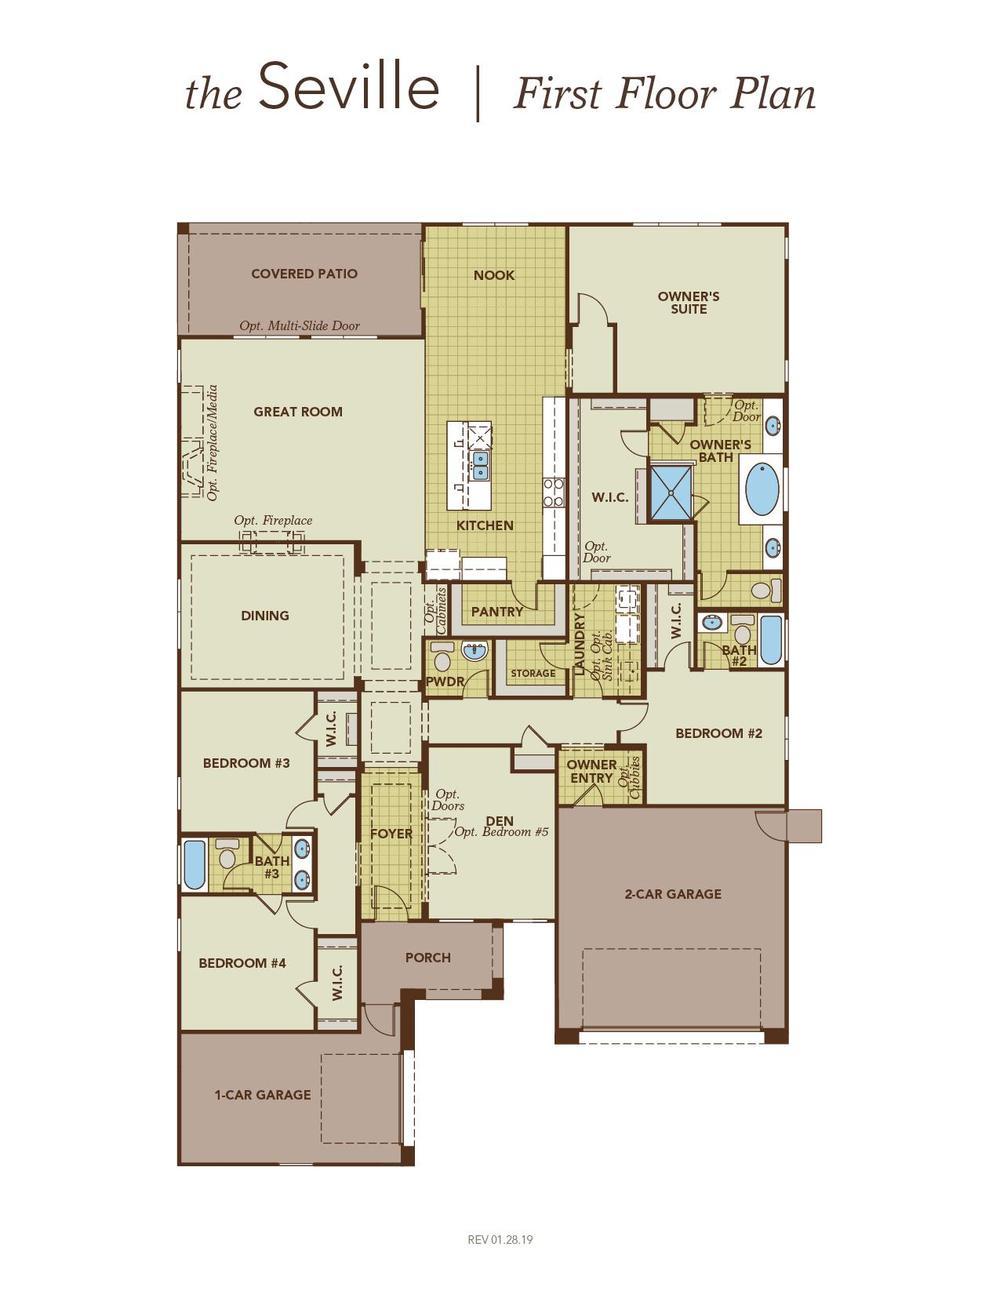 Seville - First Floor Plan